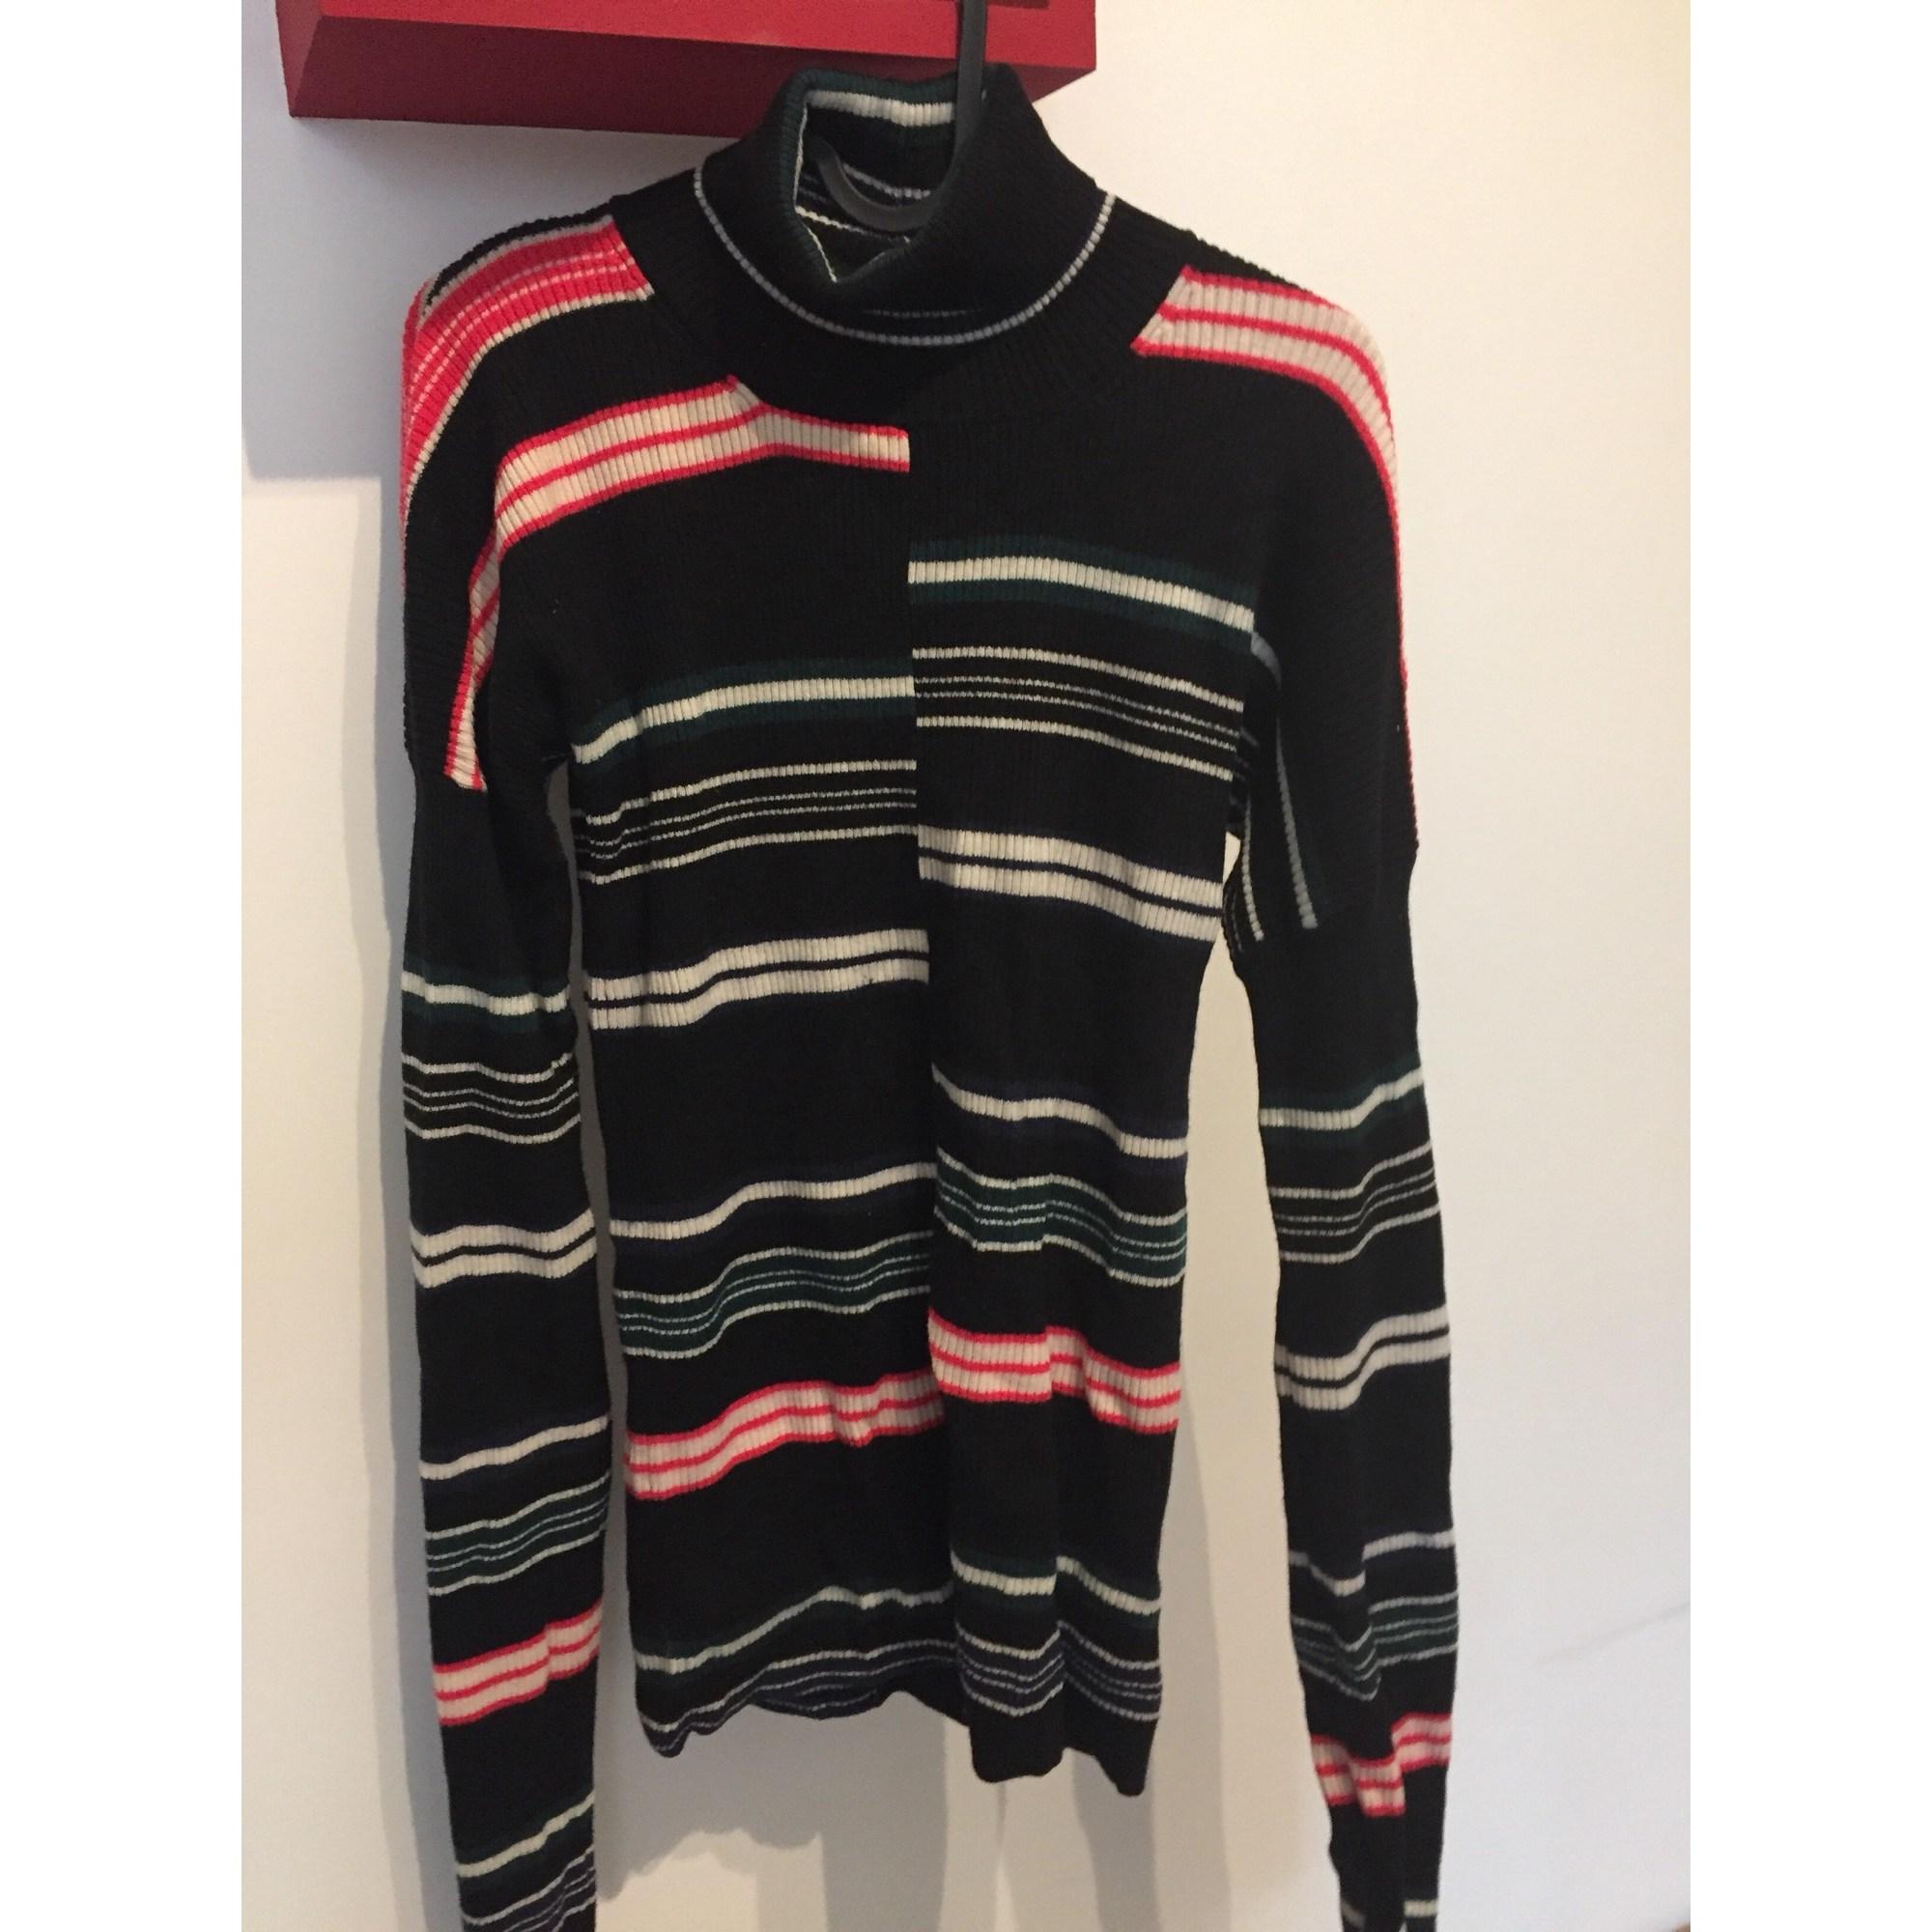 Pull KENZO 42 (L XL, T4) noir   blanc   rouge - 8251305 04f86c9fb32